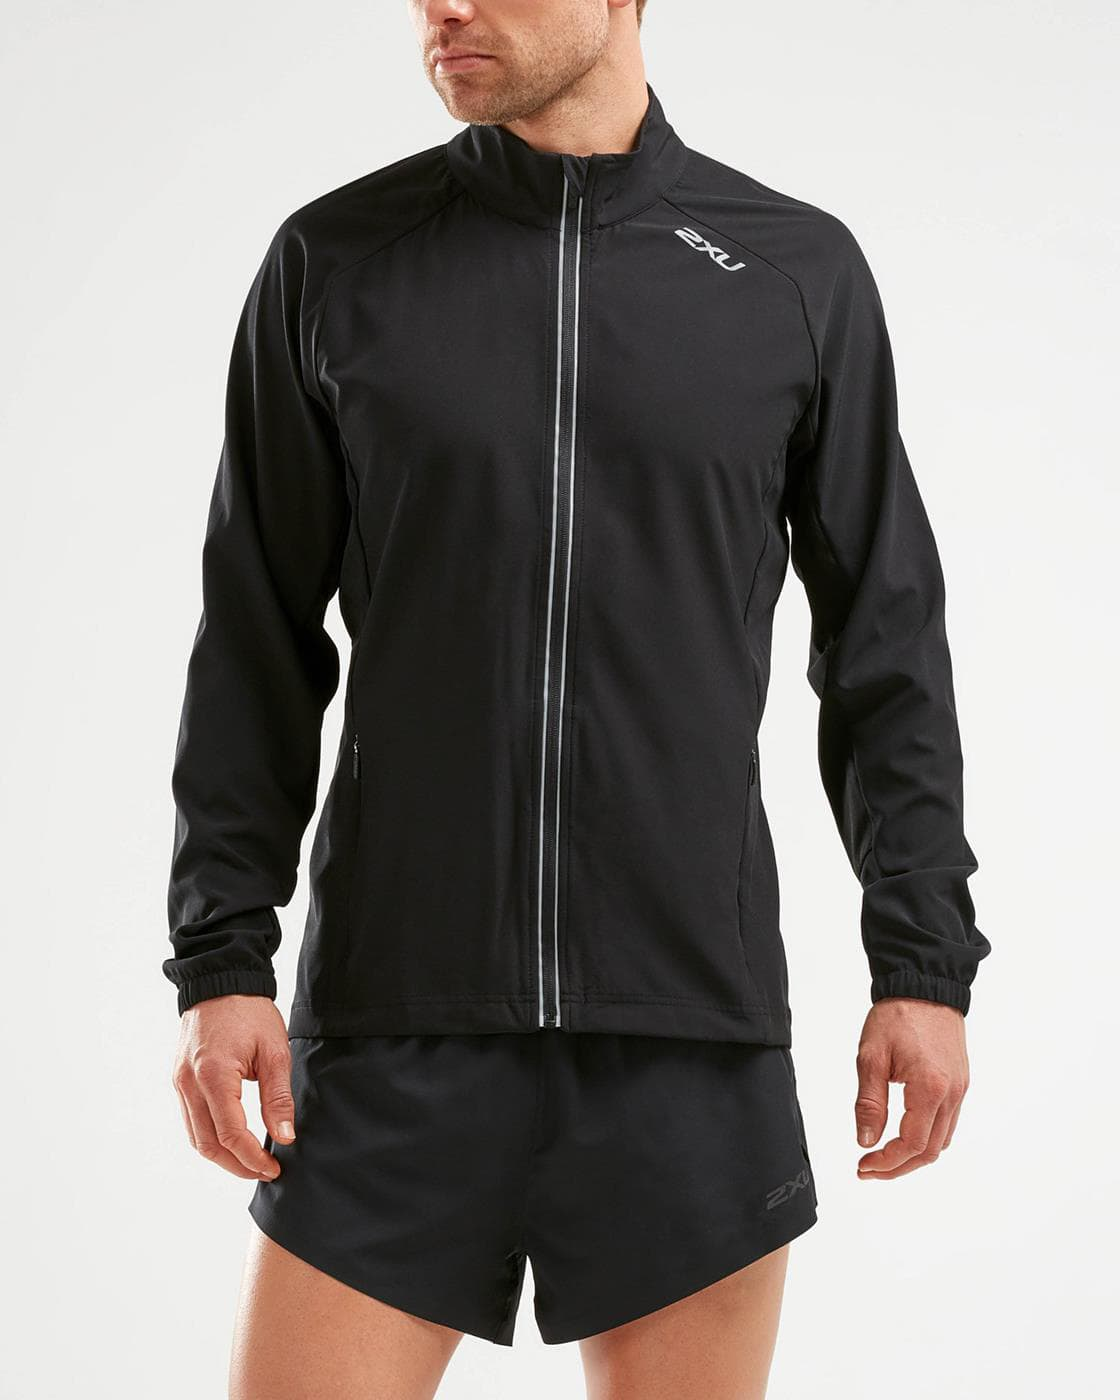 WEB_Image 2XU X-VENT Run Jacket Herre mr5603a_blk-blk602628849